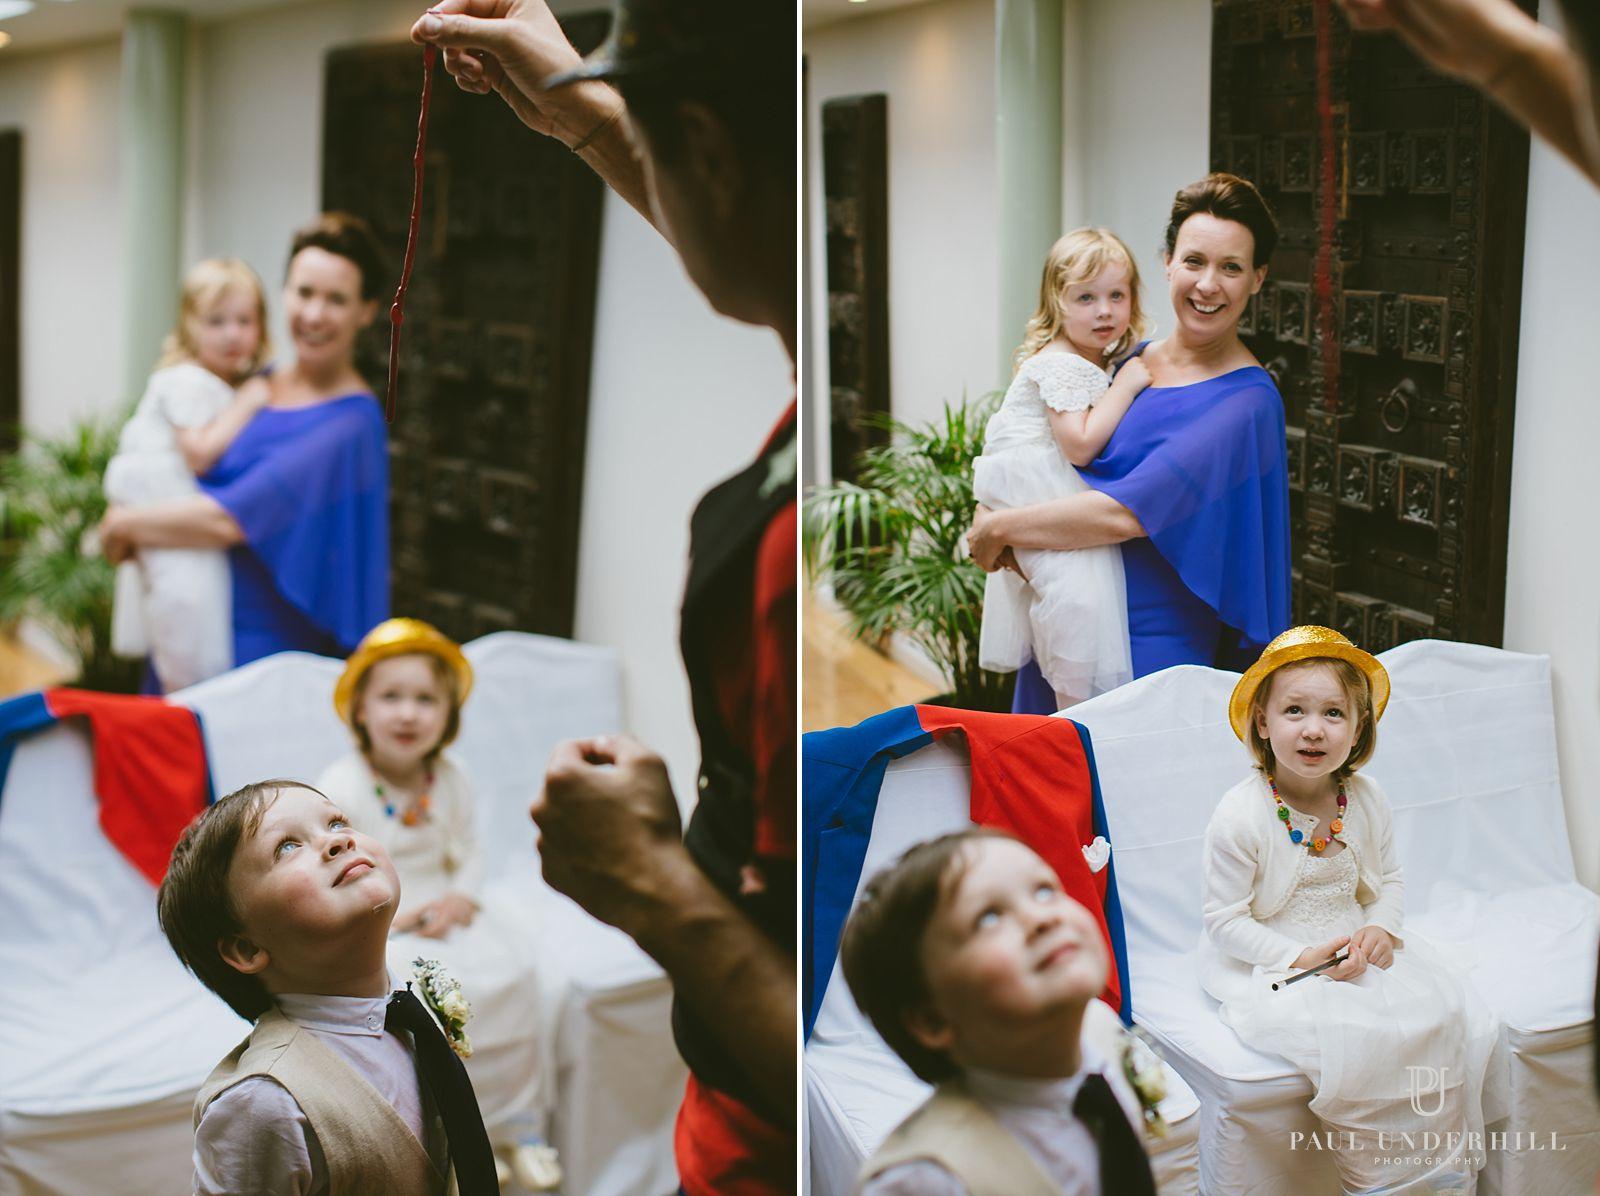 Creaitve wedding documentary